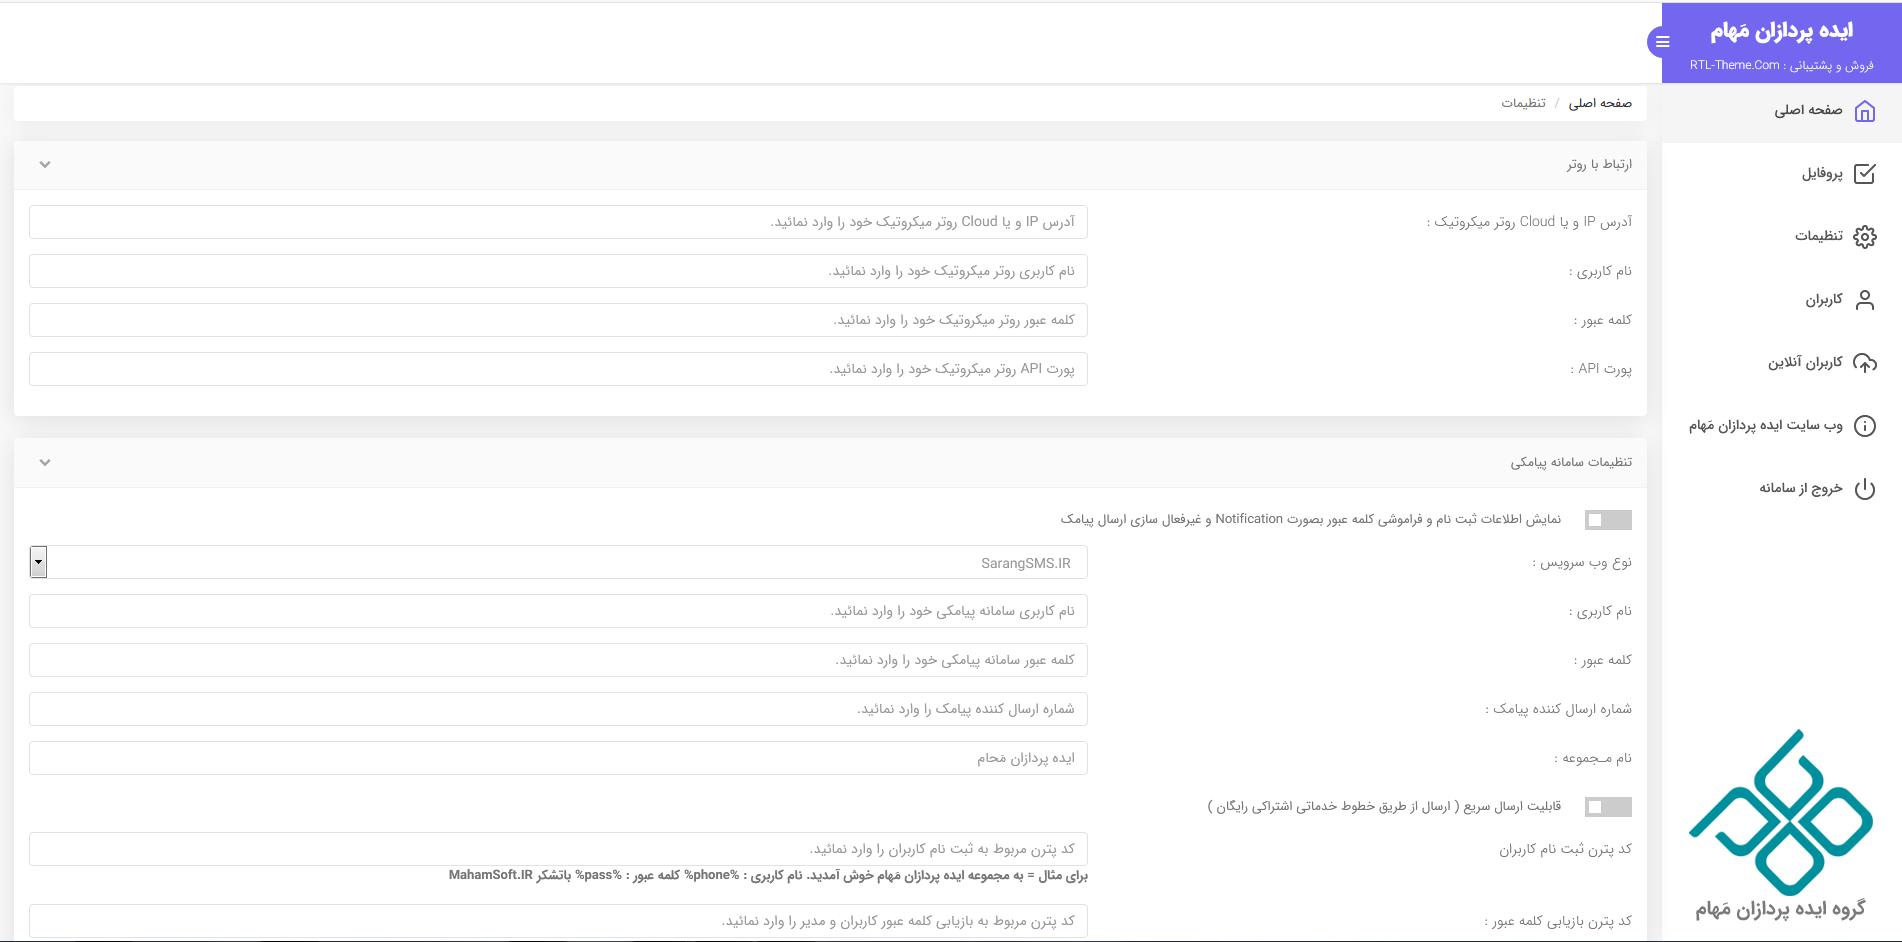 7360 7af491d910f9bcaa6df5ec791 - اسکریپت Maham | اسکریپت هات اسپات مدیریت شبکه WIFI مهام